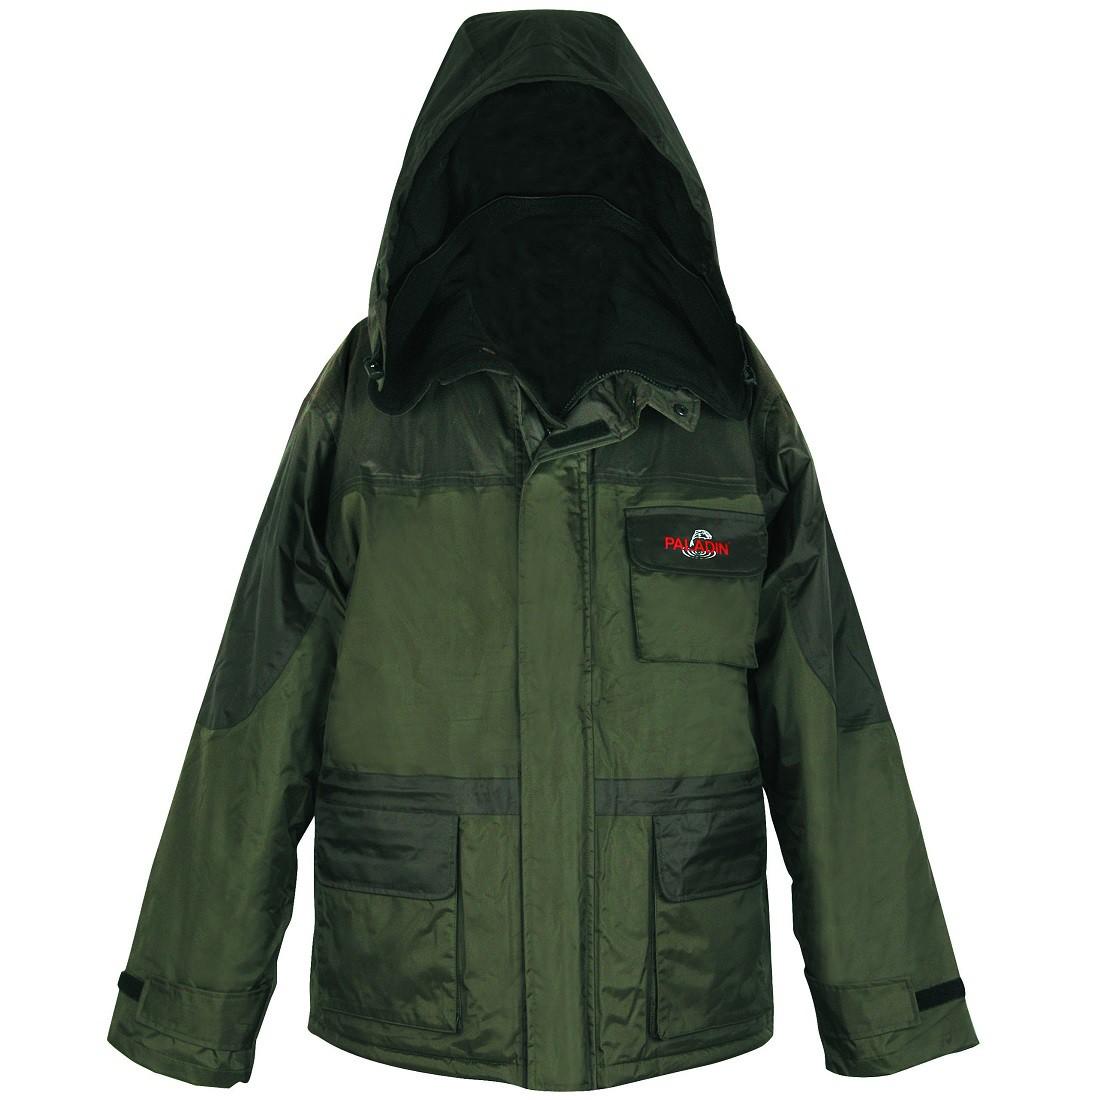 Paladin Thermo-Anzug Frostproof 2-teilig Gr XL Winter Jacke Latz-Hose Isoliert Angelsport Bekleidung